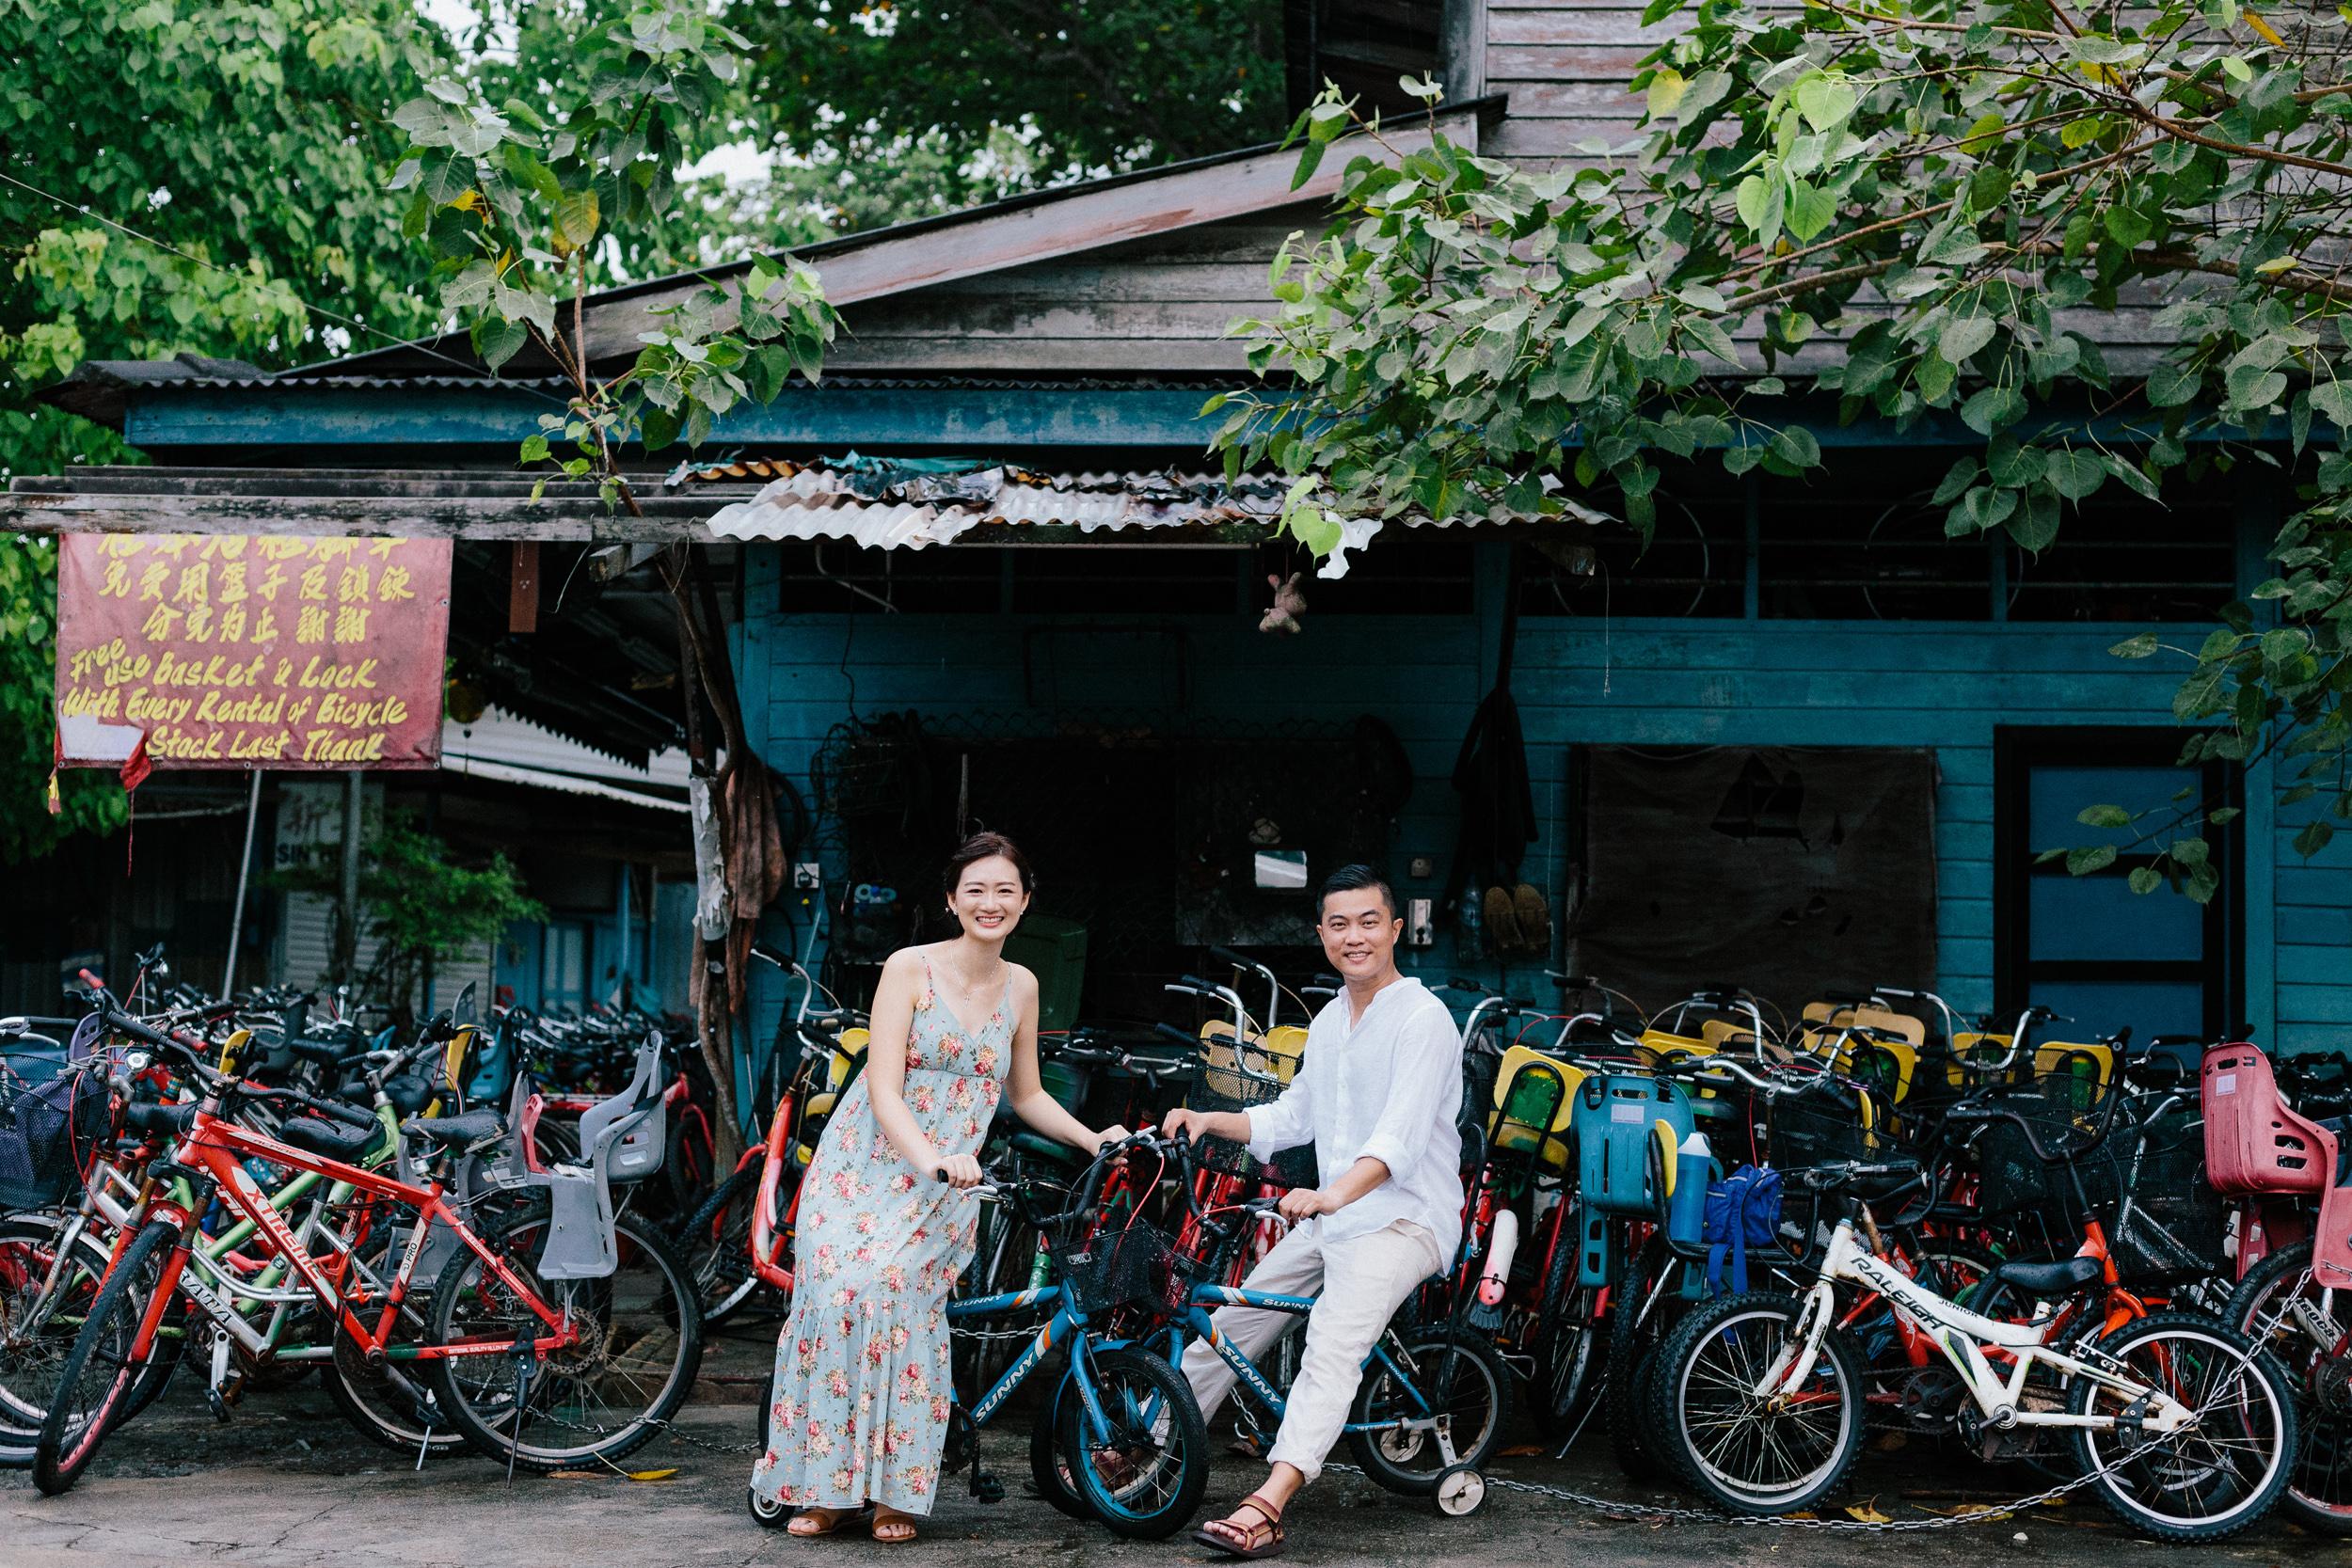 singapore-wedding-photographer-wemadethese-junekit-kingslin-25.jpg